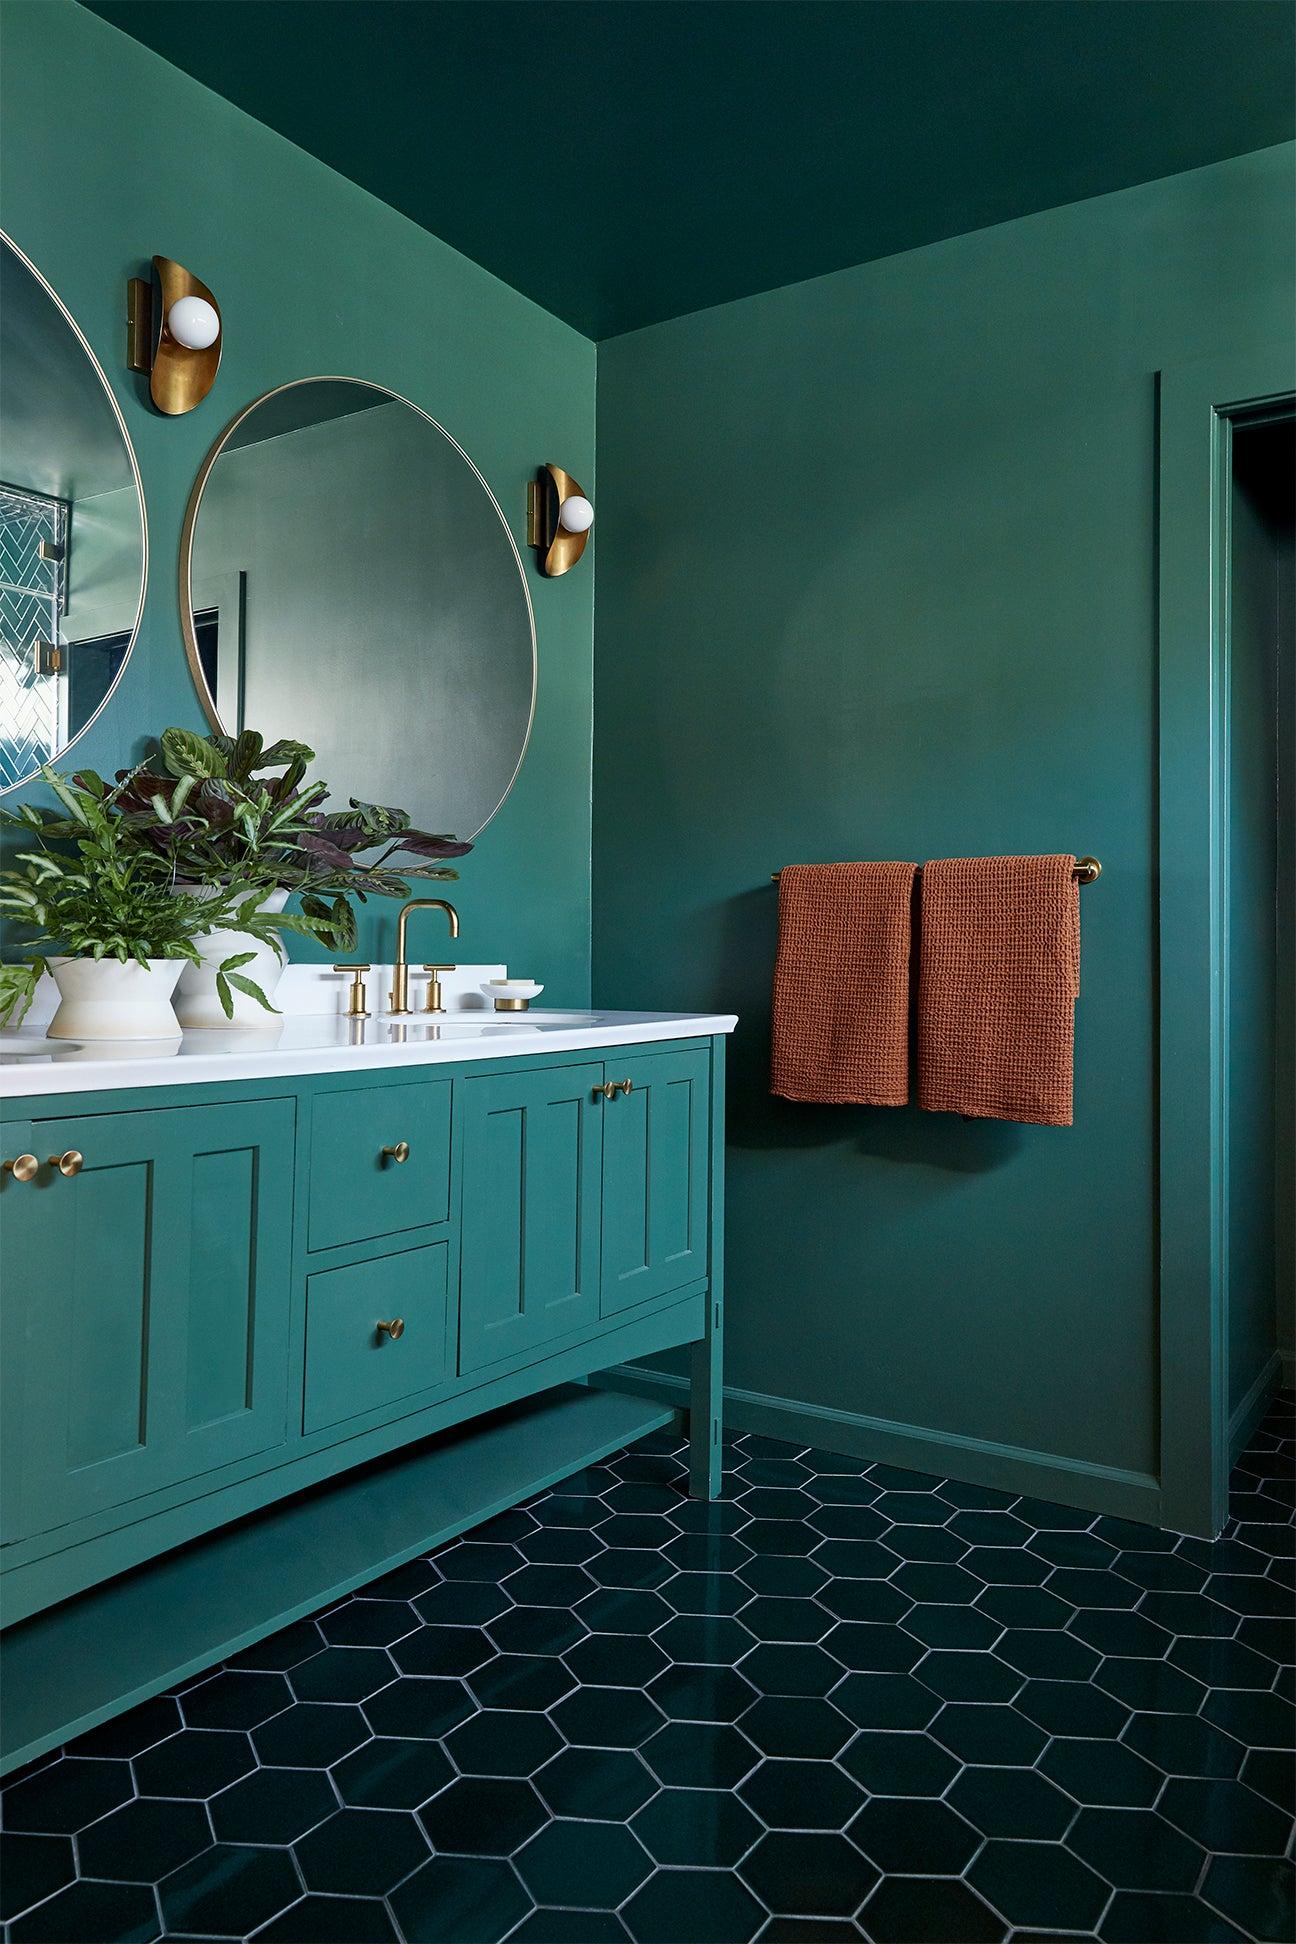 Emerald Green Bathroom Tiles Are The Star Of Laurel